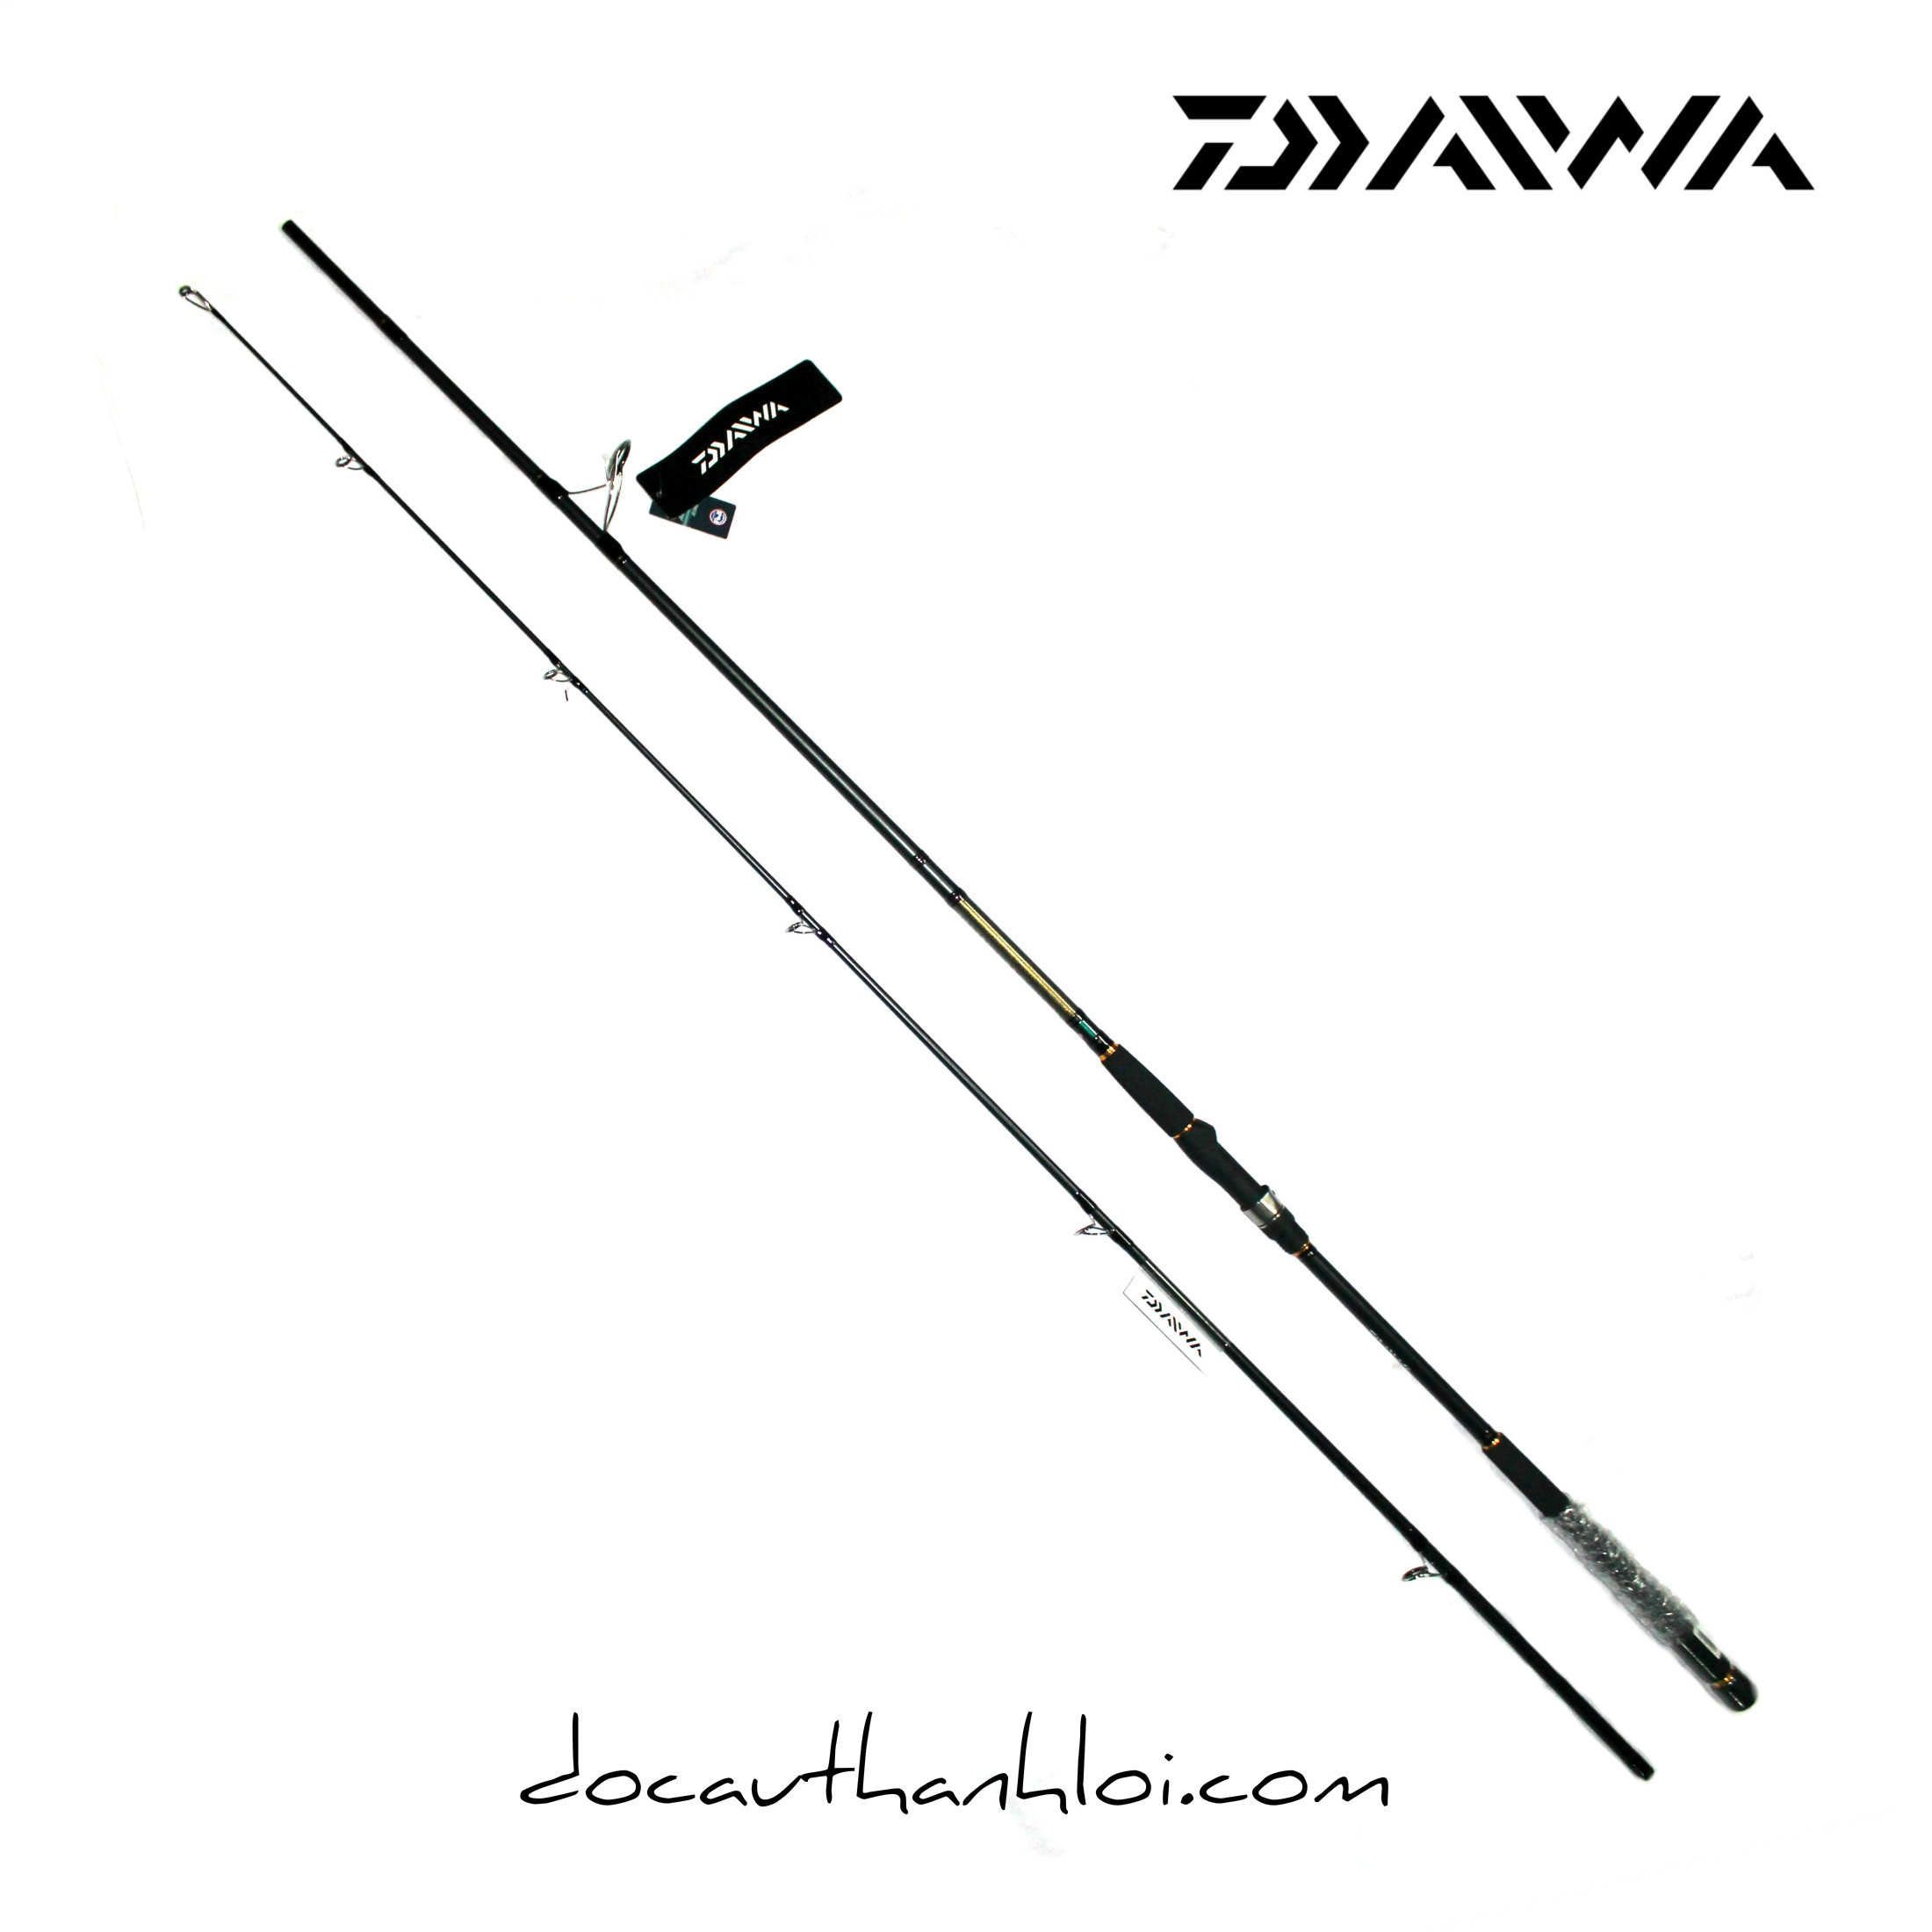 Cần Daiwa Phantom Power SD (Fuji Alconite)